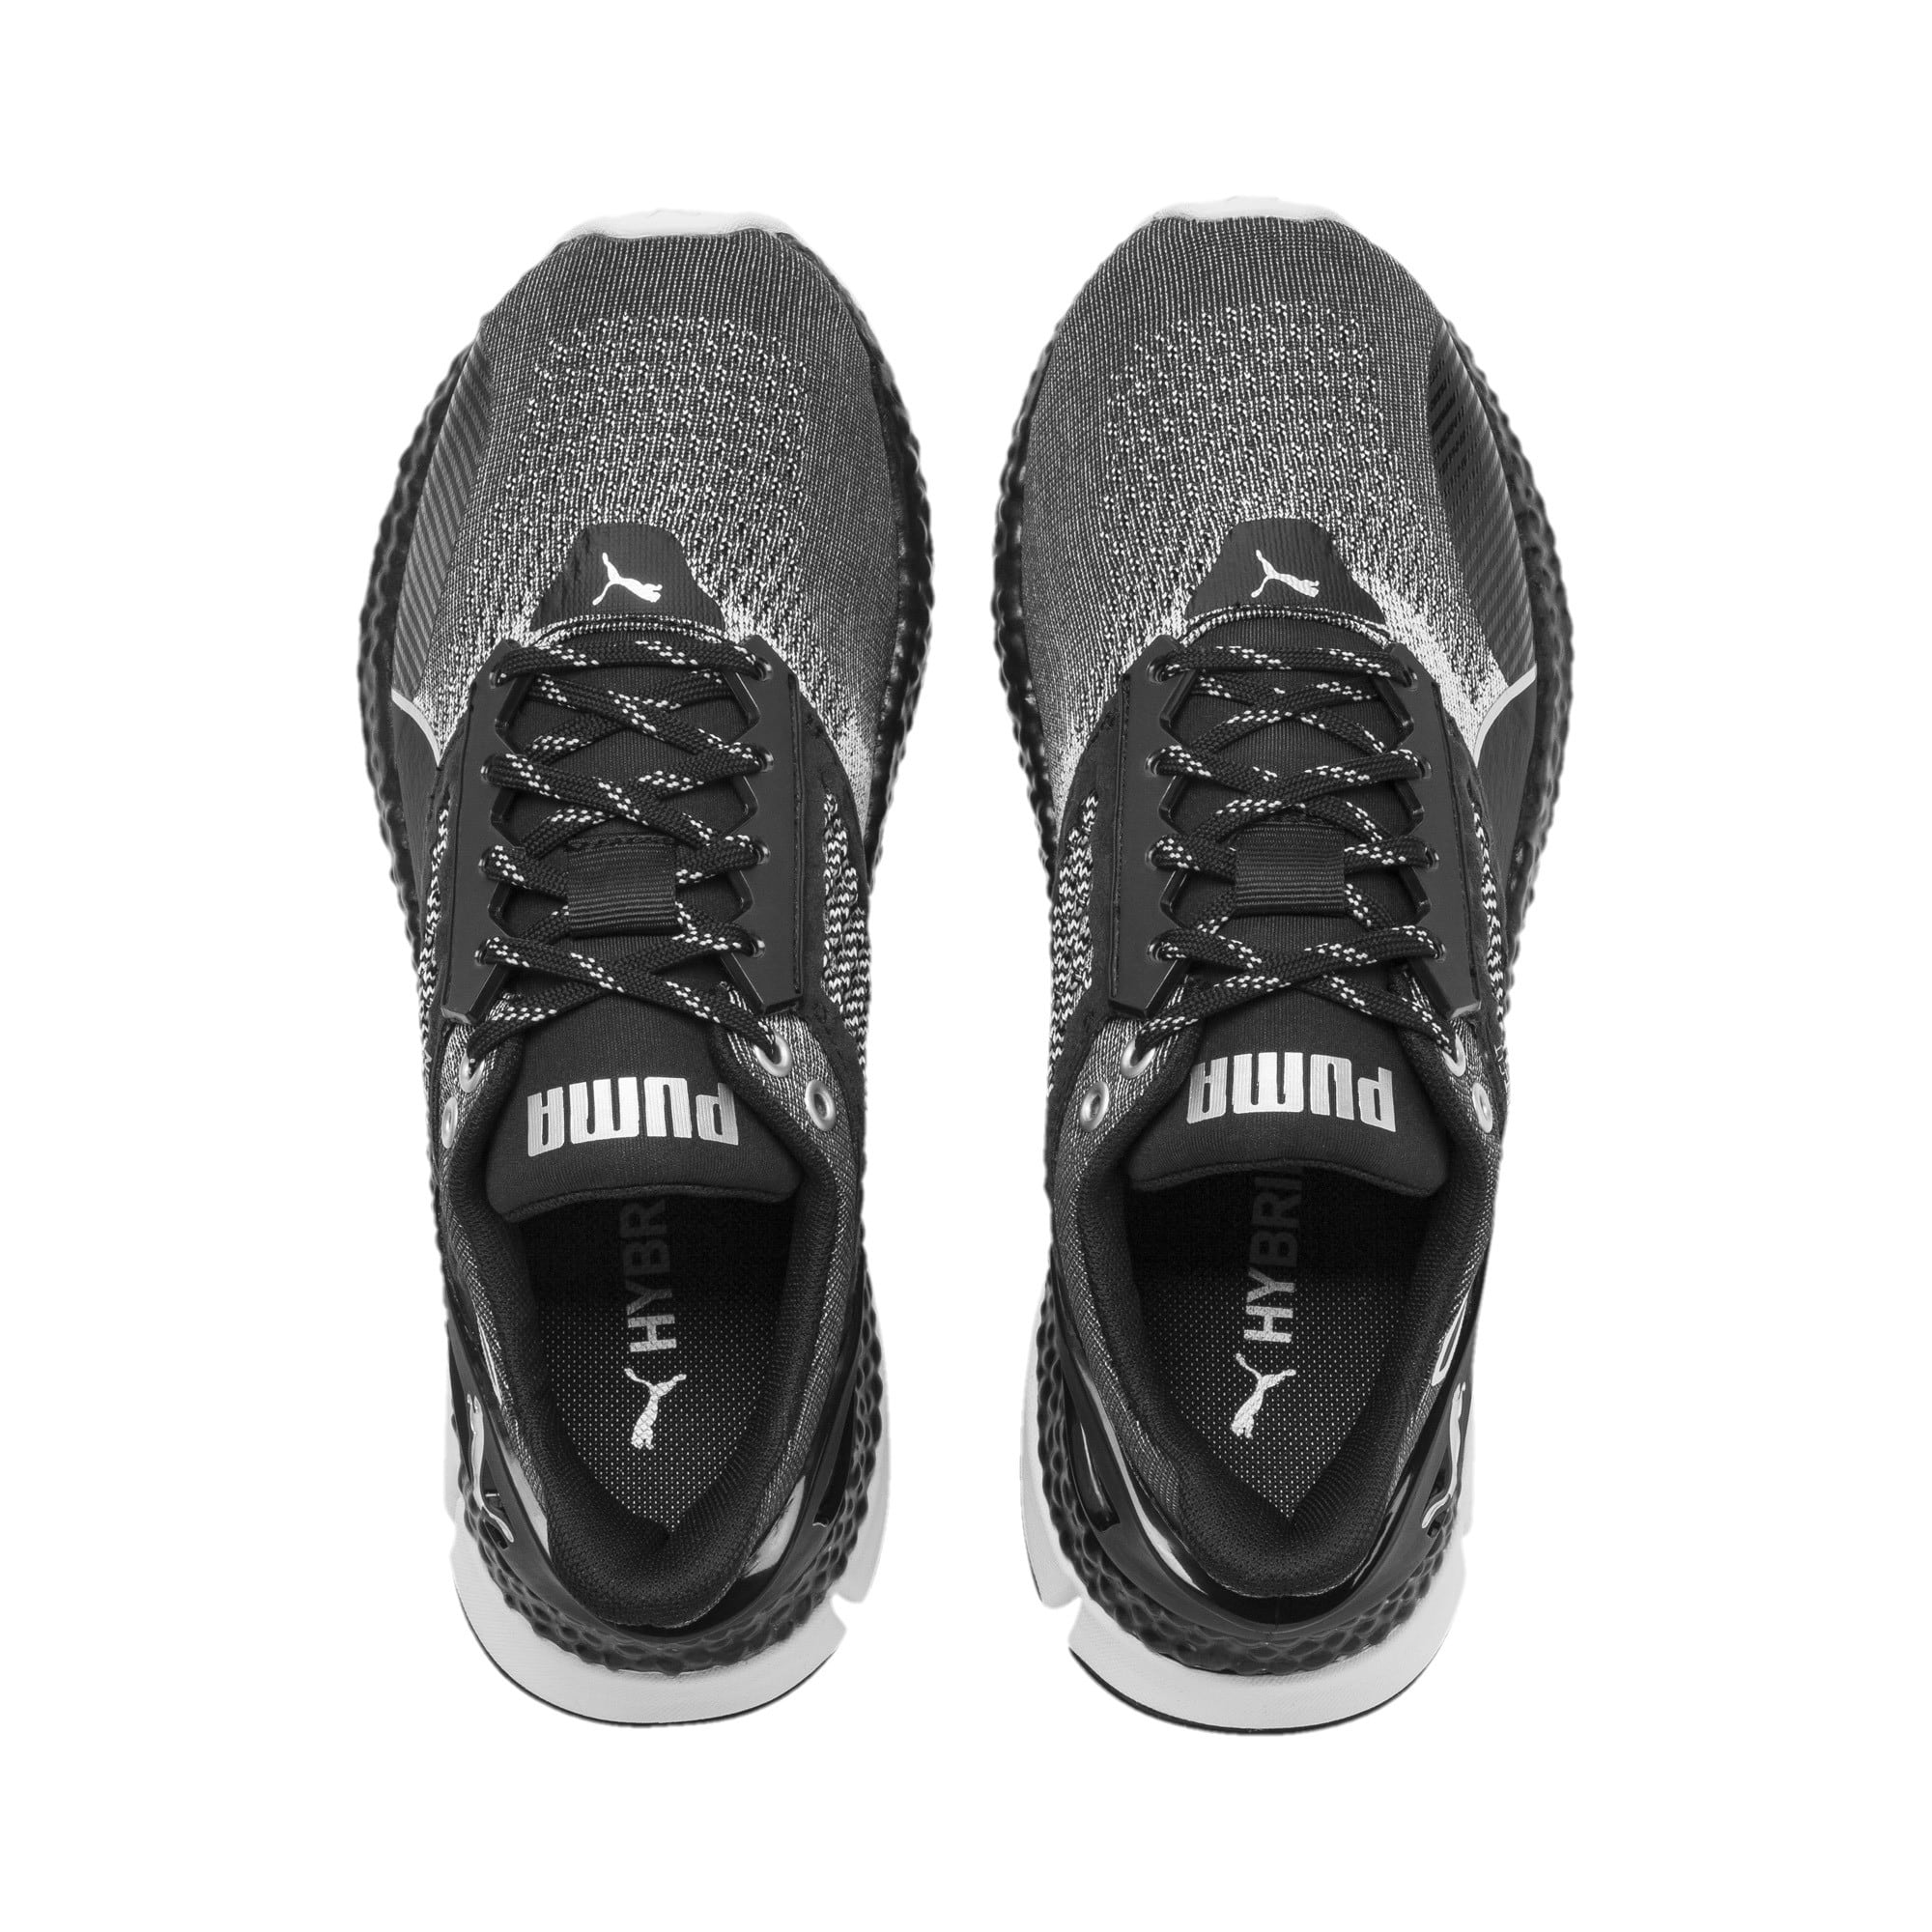 Thumbnail 9 of HYBRID NETFIT Astro Women's Running Shoes, Puma Black, medium